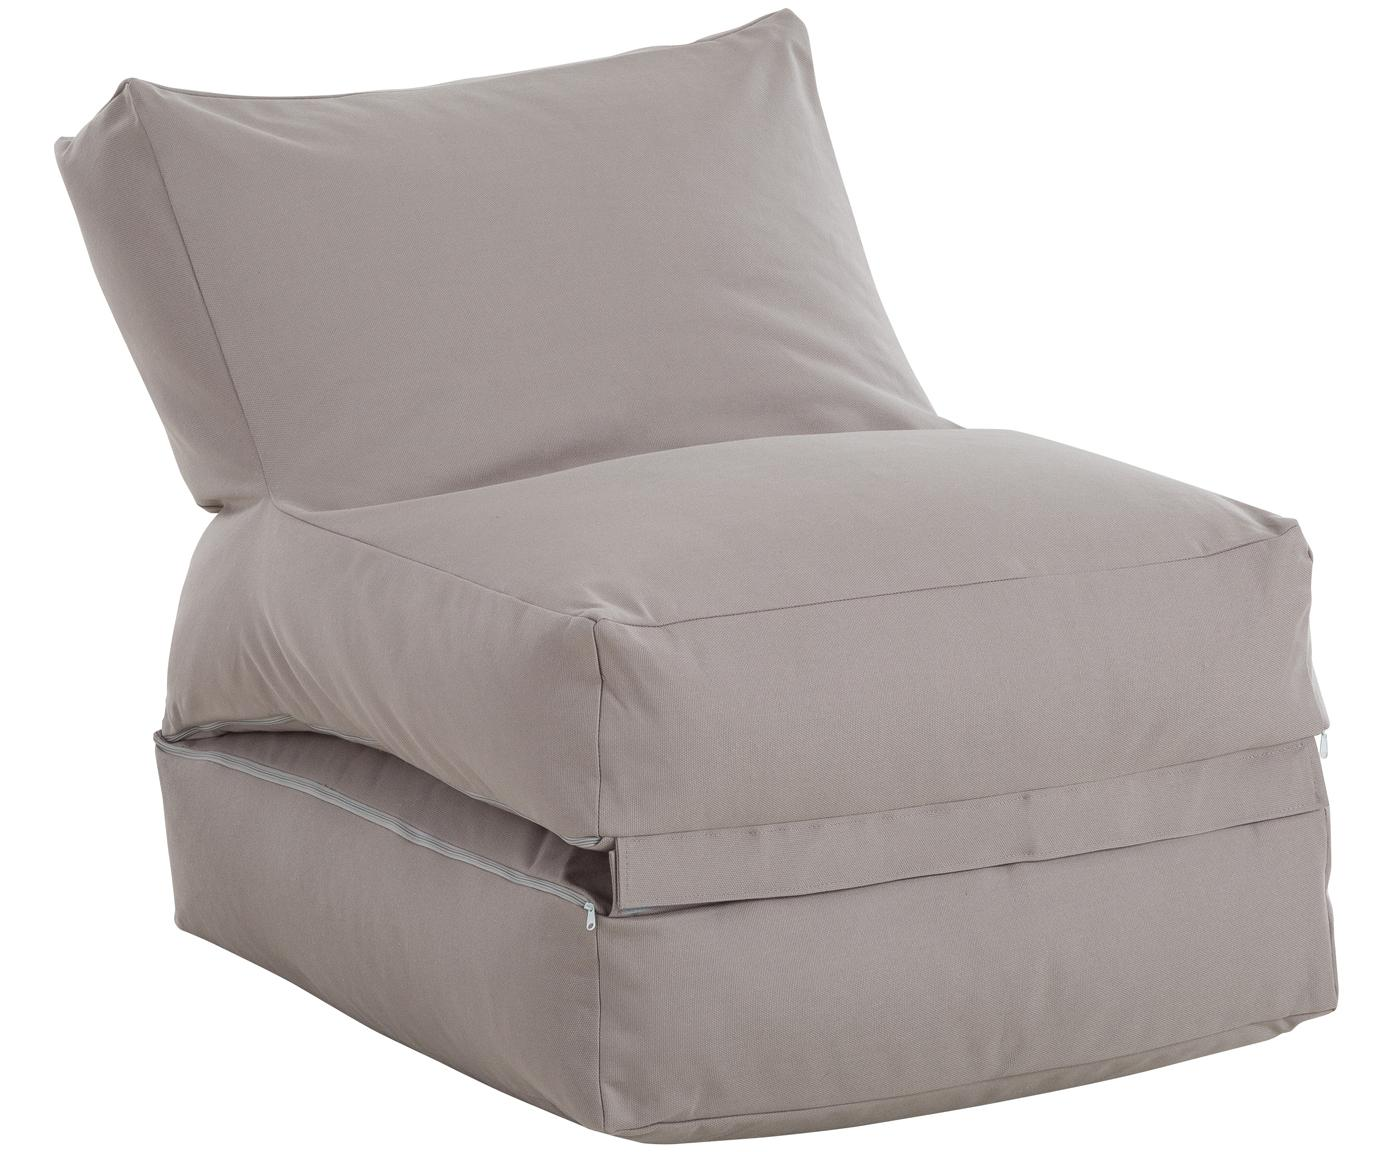 Outdoor loungefauteuil Twist met ligfunctie, Bekleding: polyacryl dralon (garen g, Grijs, B 70  x D 80 cm